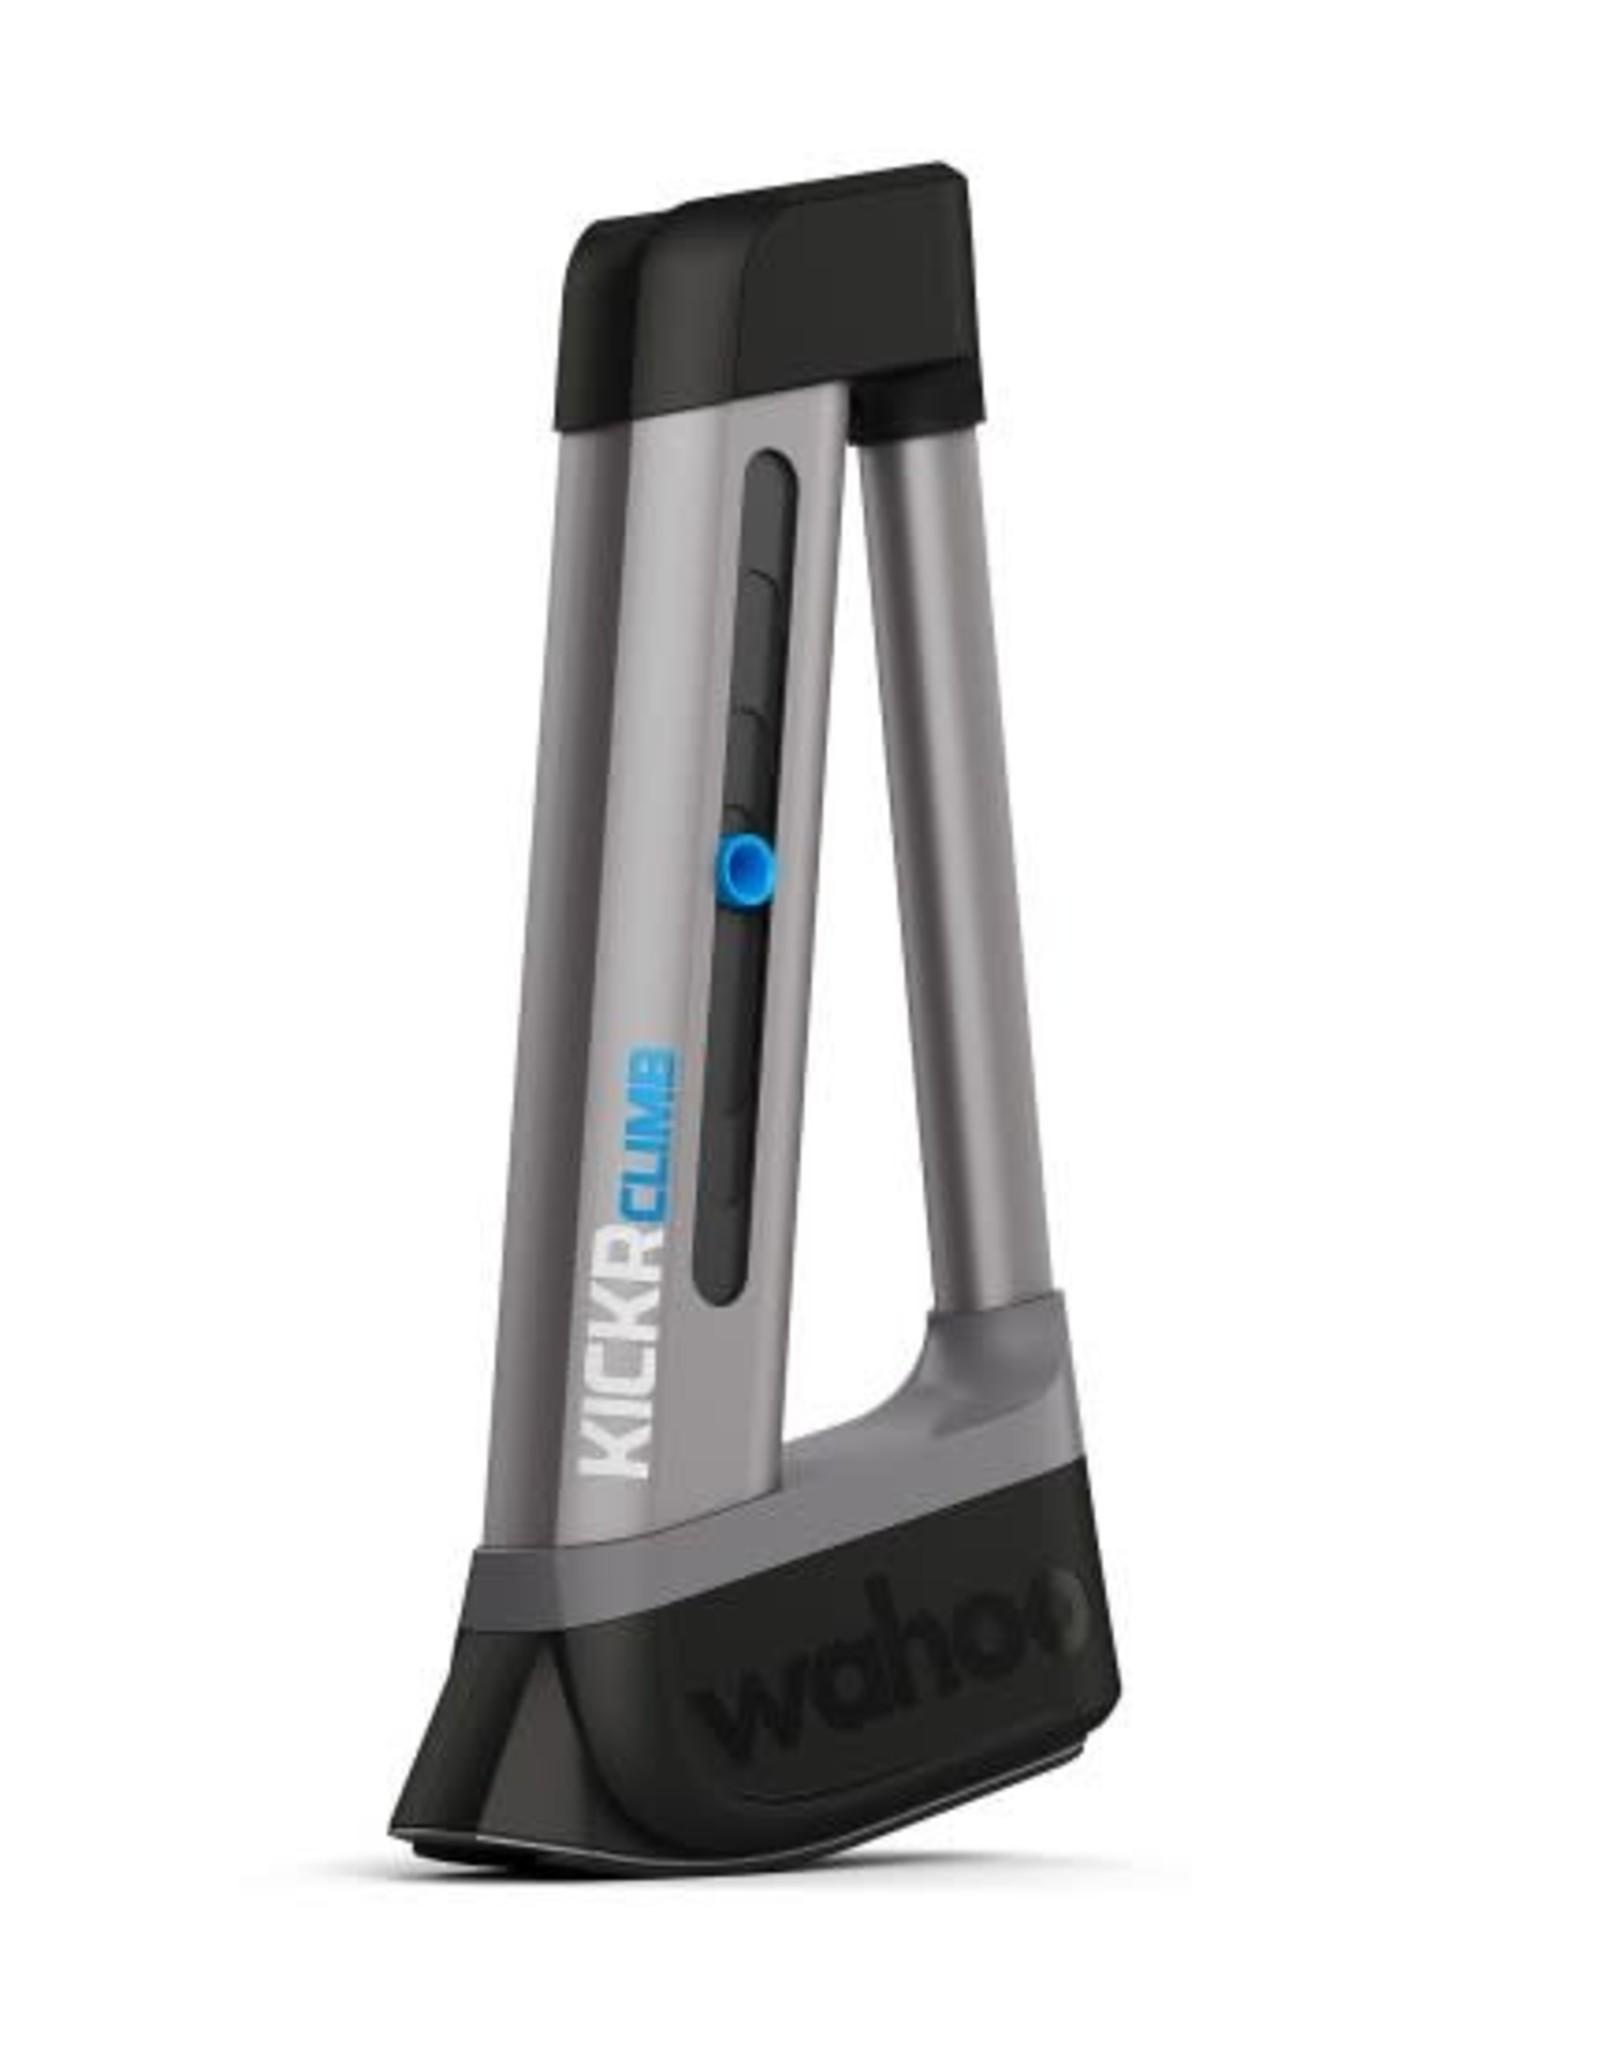 WAHOO WAHOO KICKR CLIMB smart trainer